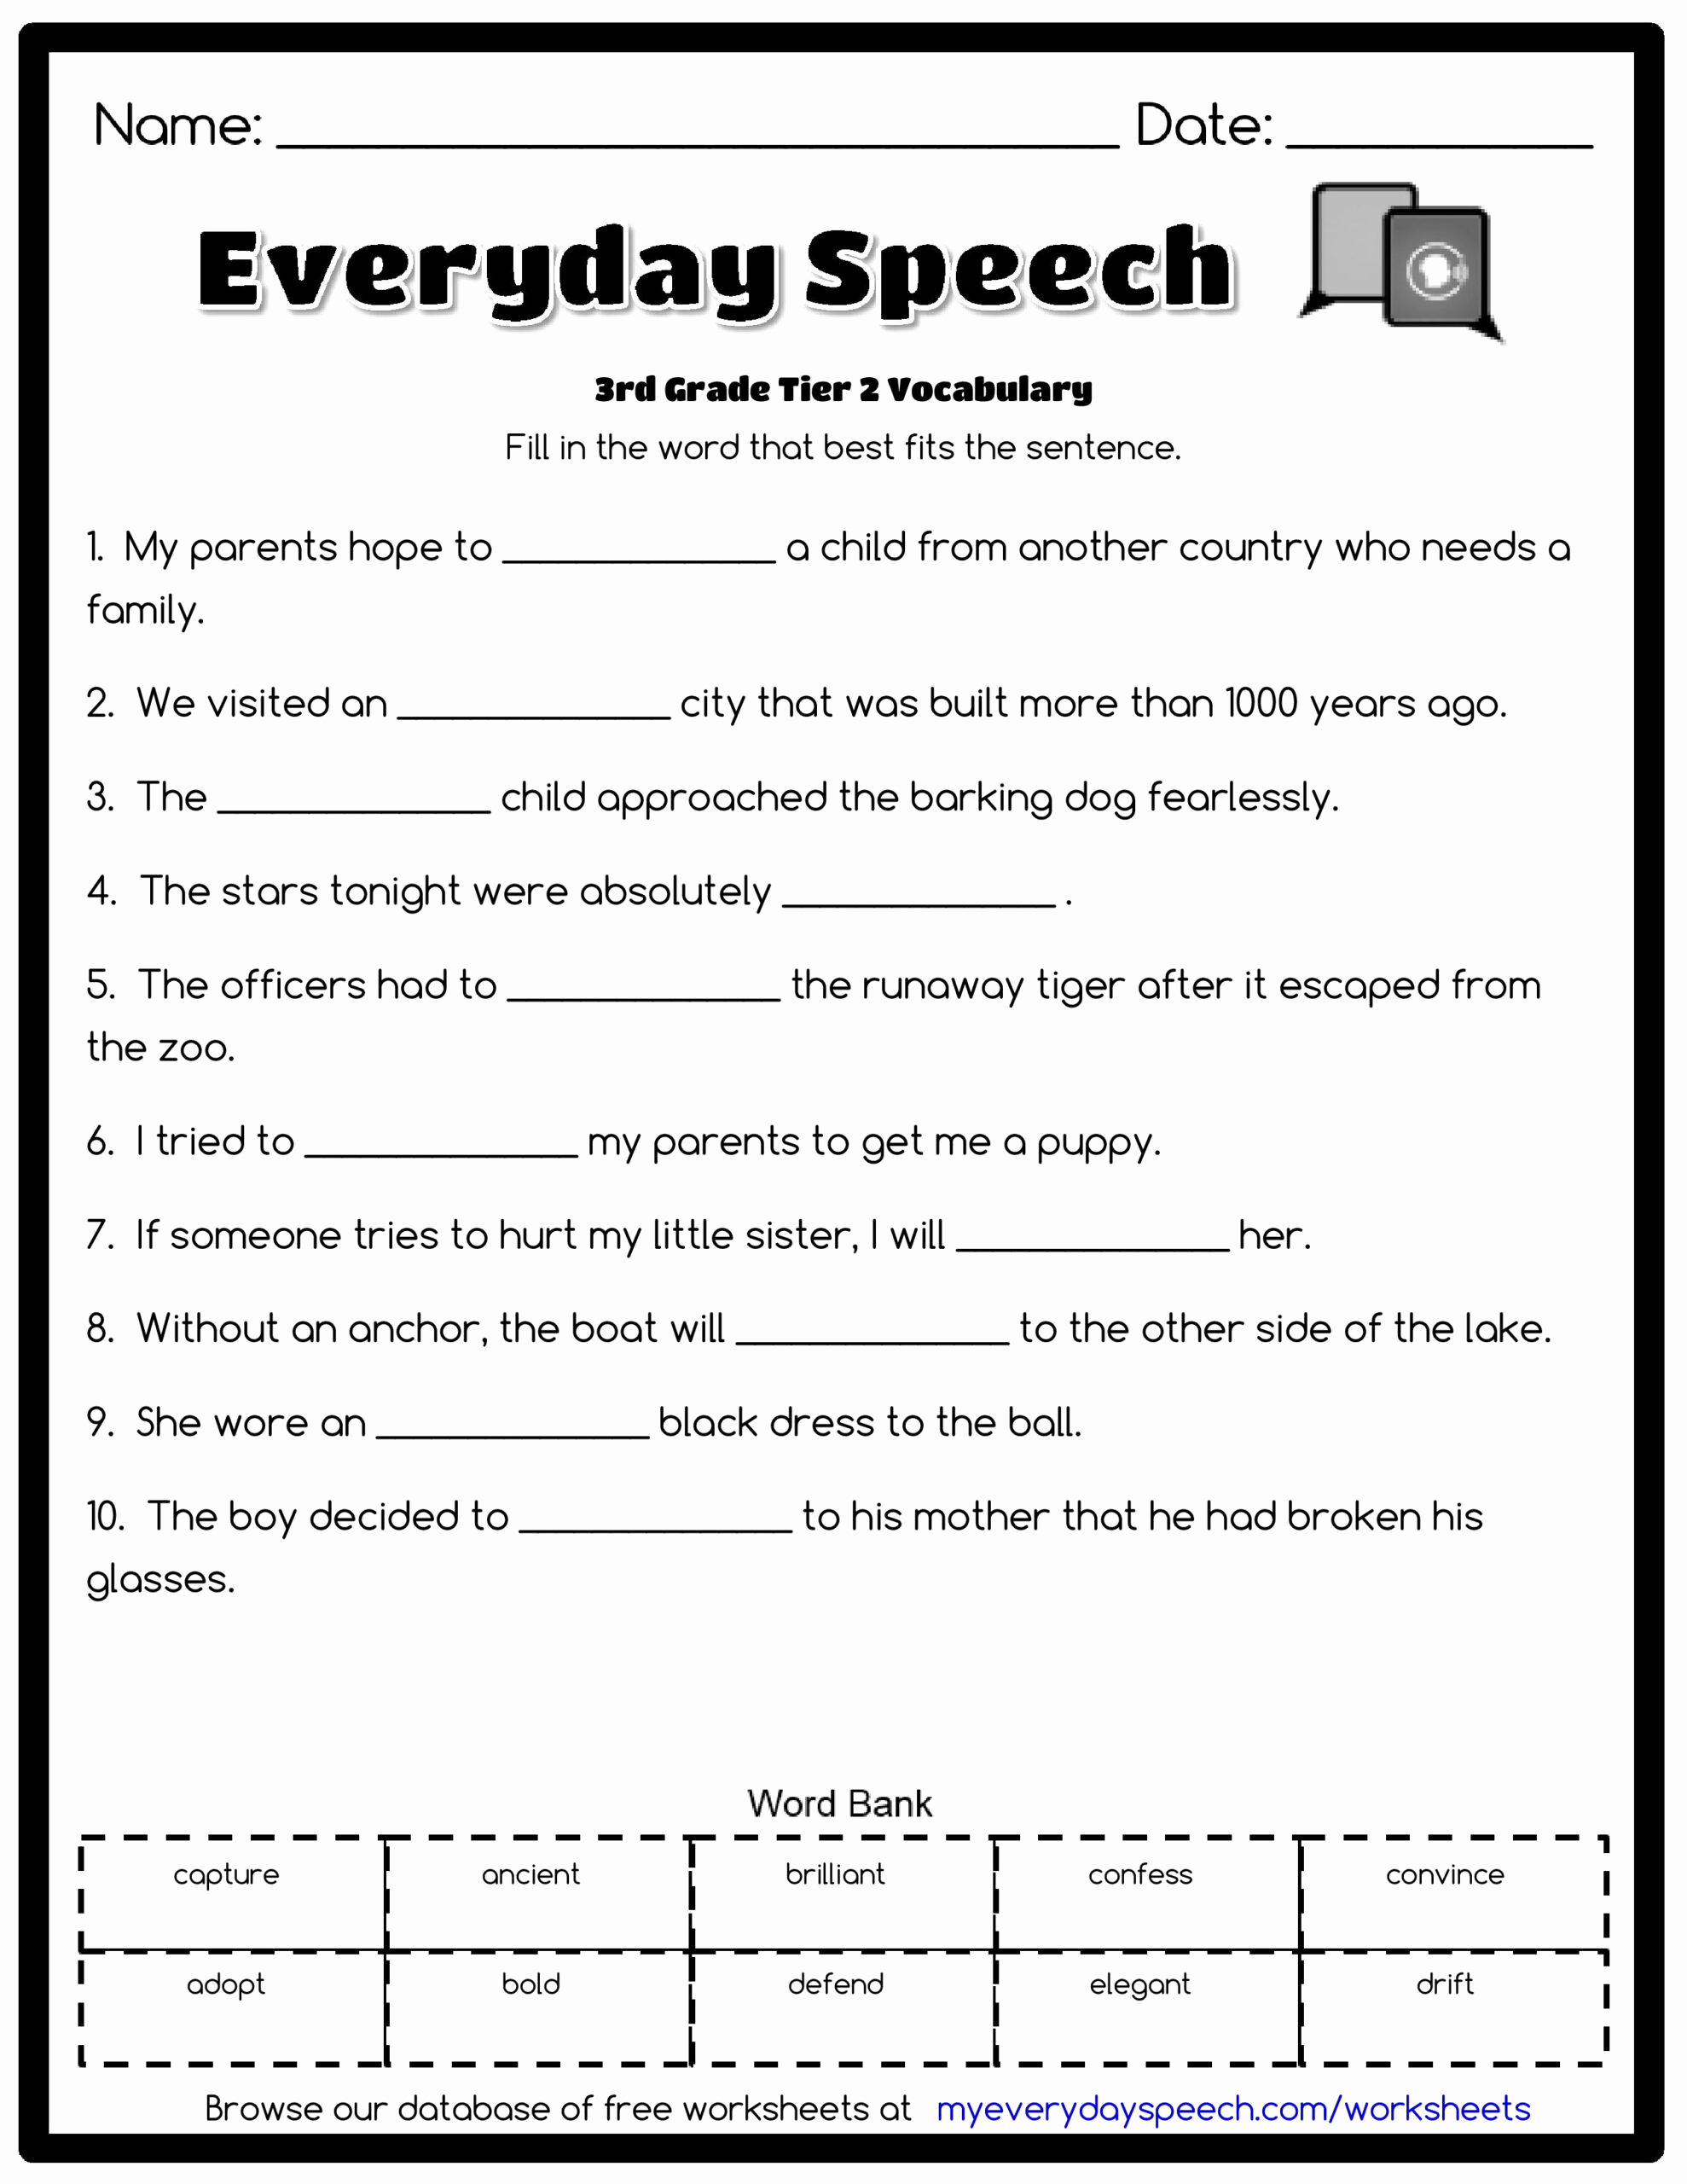 Making Inferences Worksheet 4th Grade Elegant 20 4th Grade Inferencing Worksheets